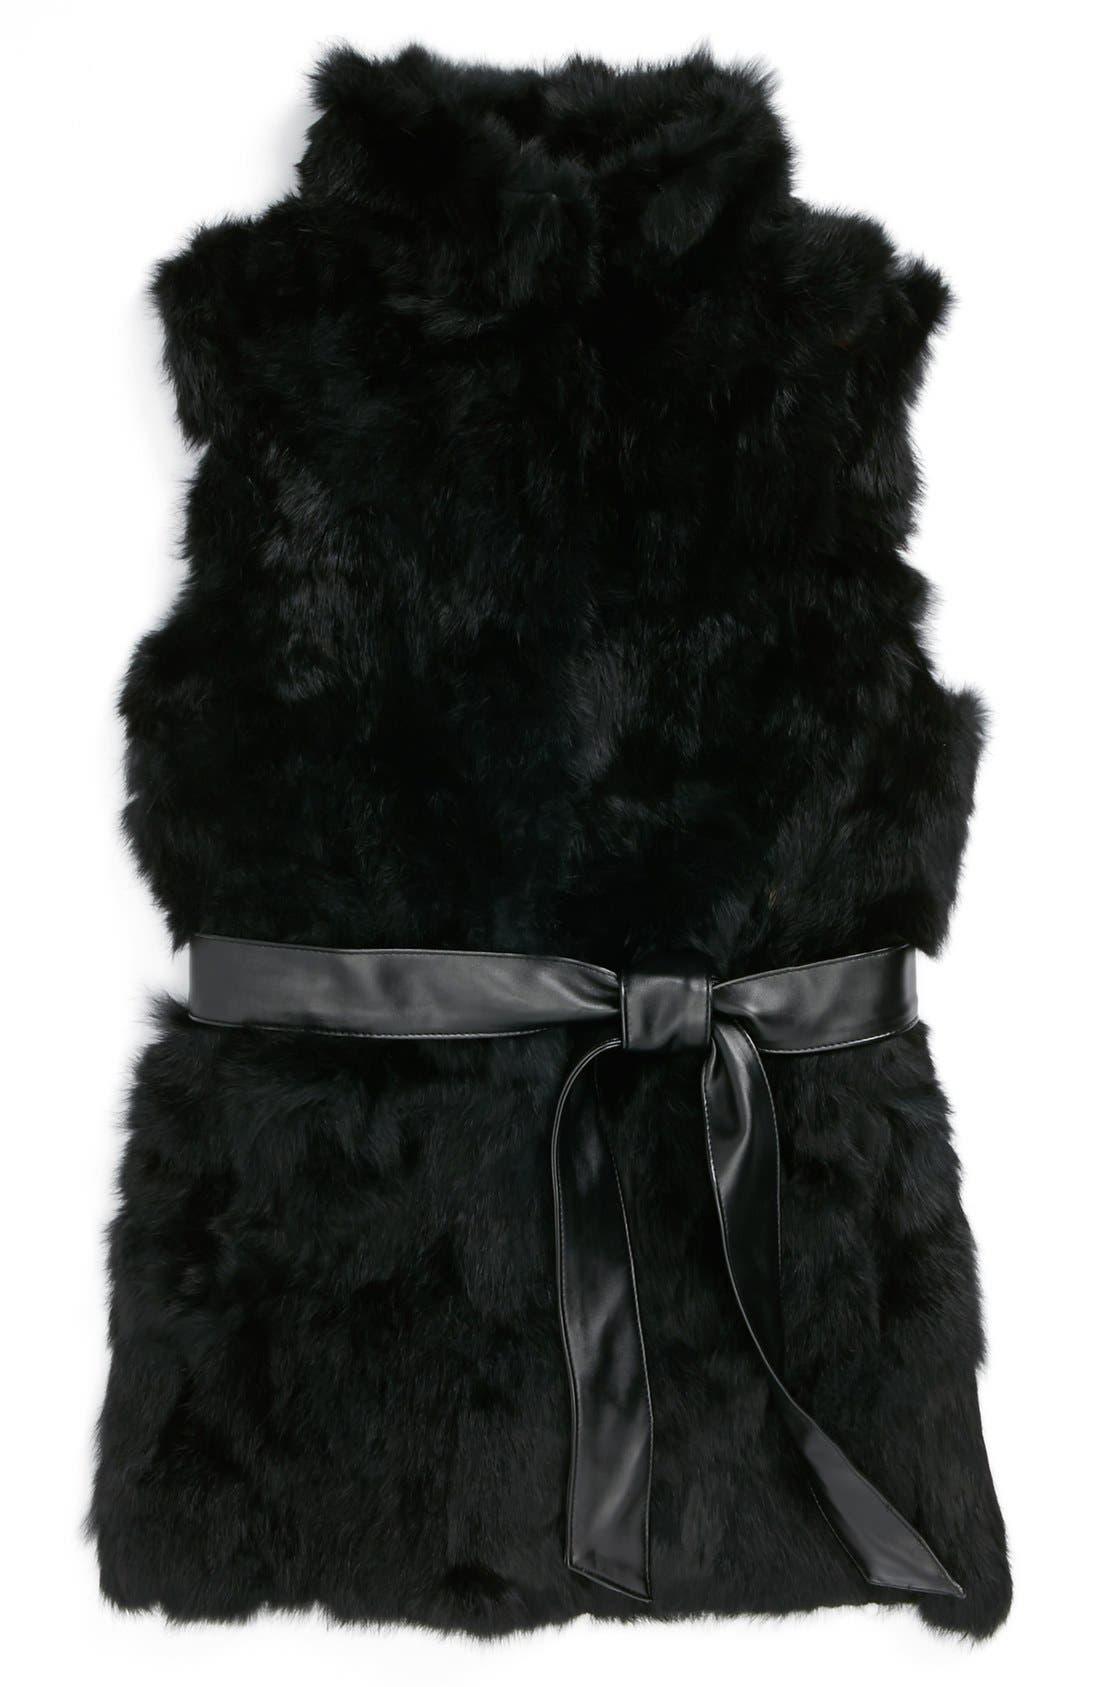 LA FIORENTINA Genuine Rabbit Fur Vest, Main, color, 001